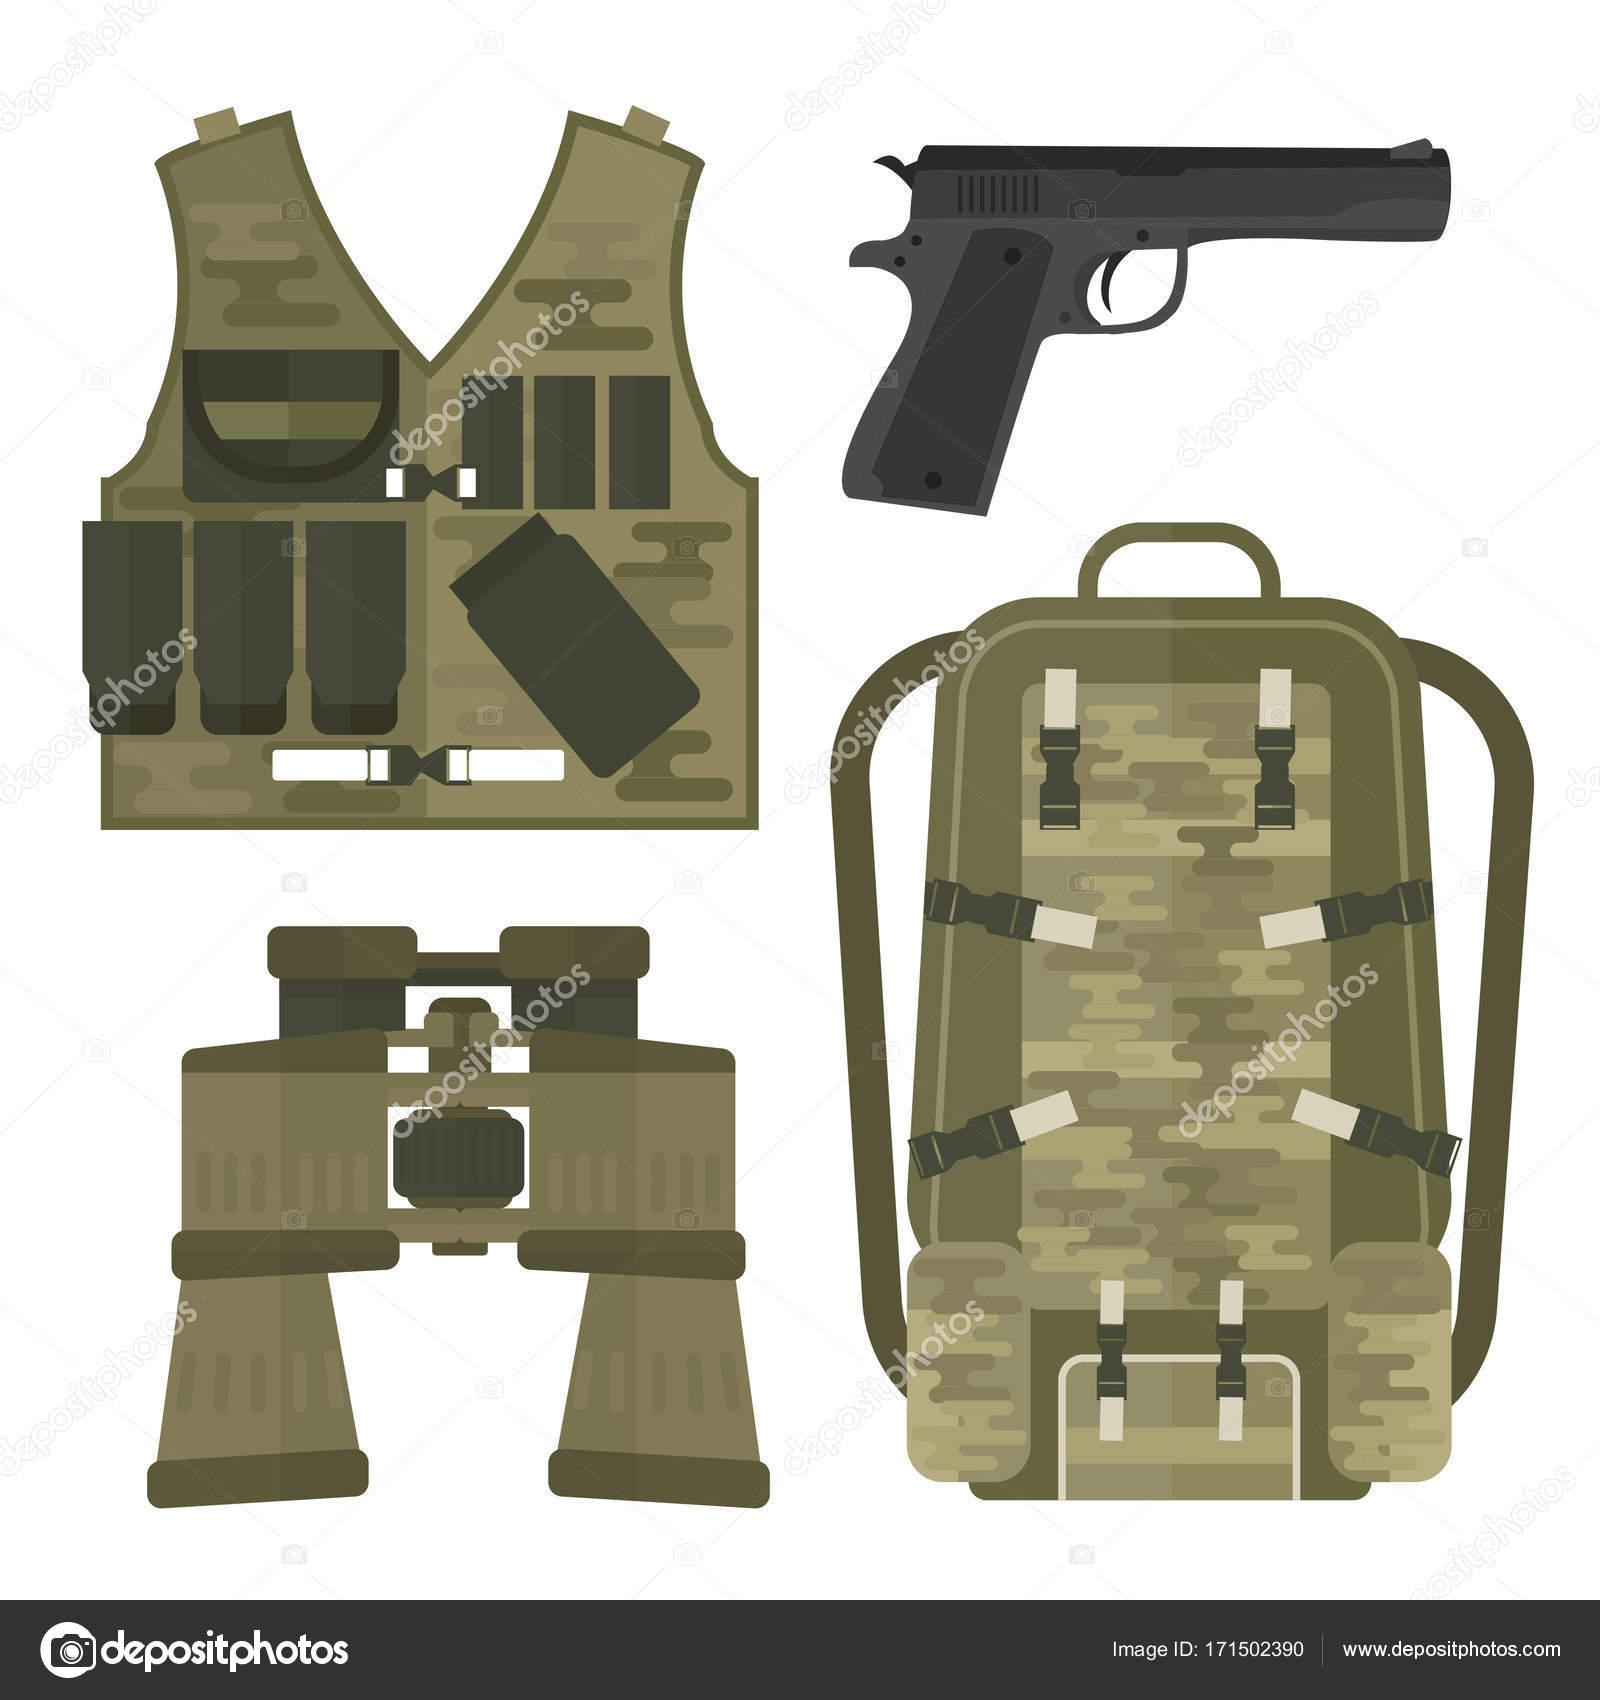 2c00817364 Στρατιωτικό όπλο όπλα πανοπλία δυνάμεις αμερικανικό μαχητικό πυρομαχικά  καμουφλάζ σημάδι διανυσματικά εικονογράφηση — Διανυσματικό Αρχείο